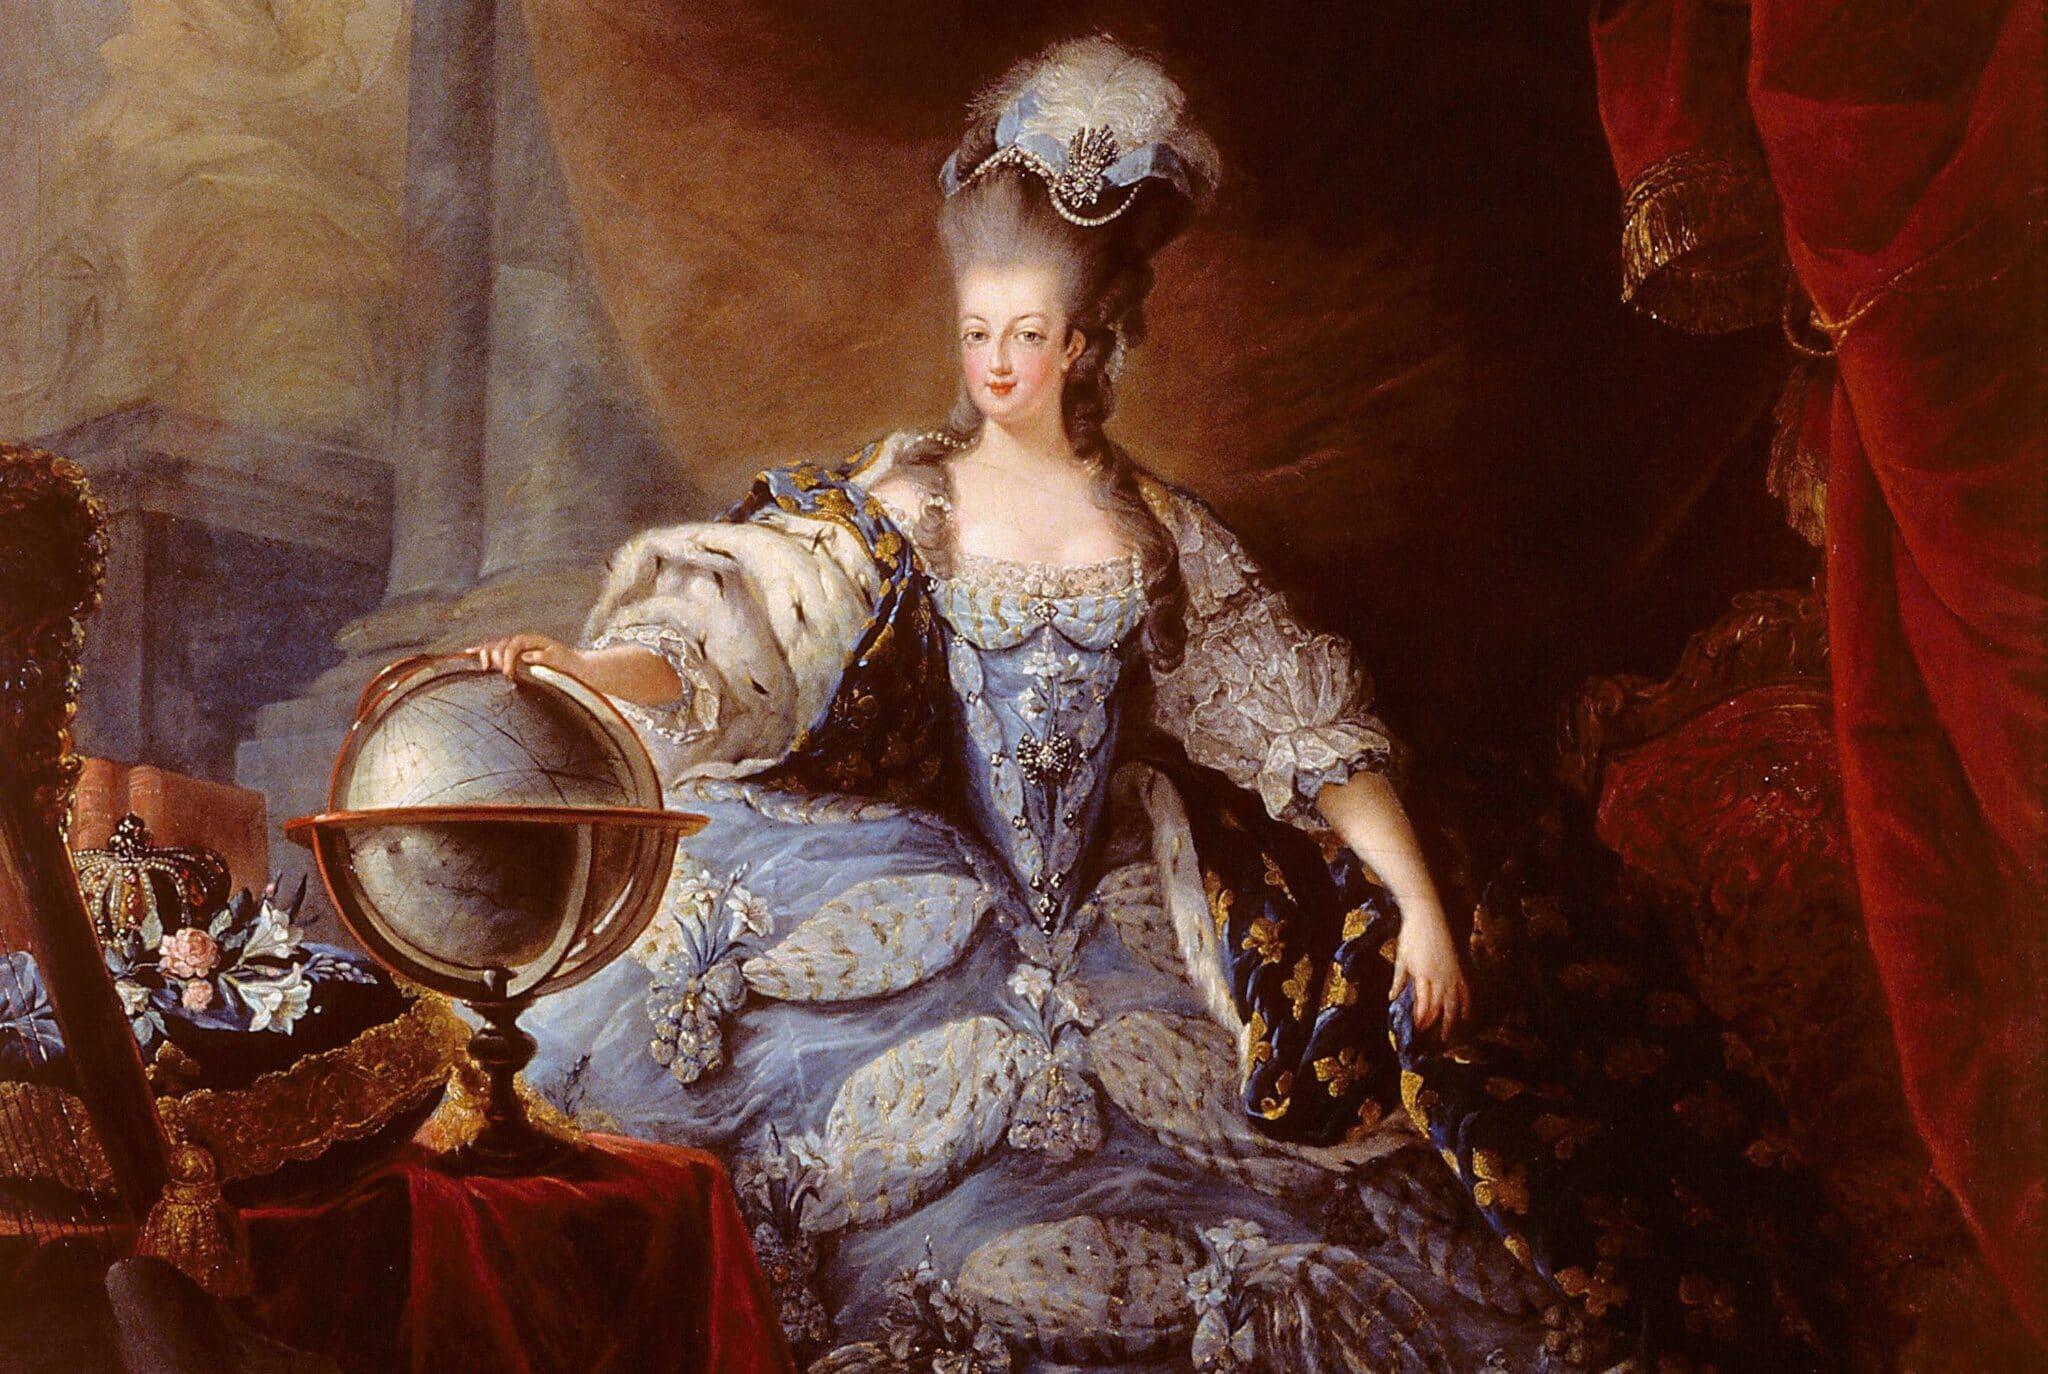 Мария-Антуанетта Австрийская